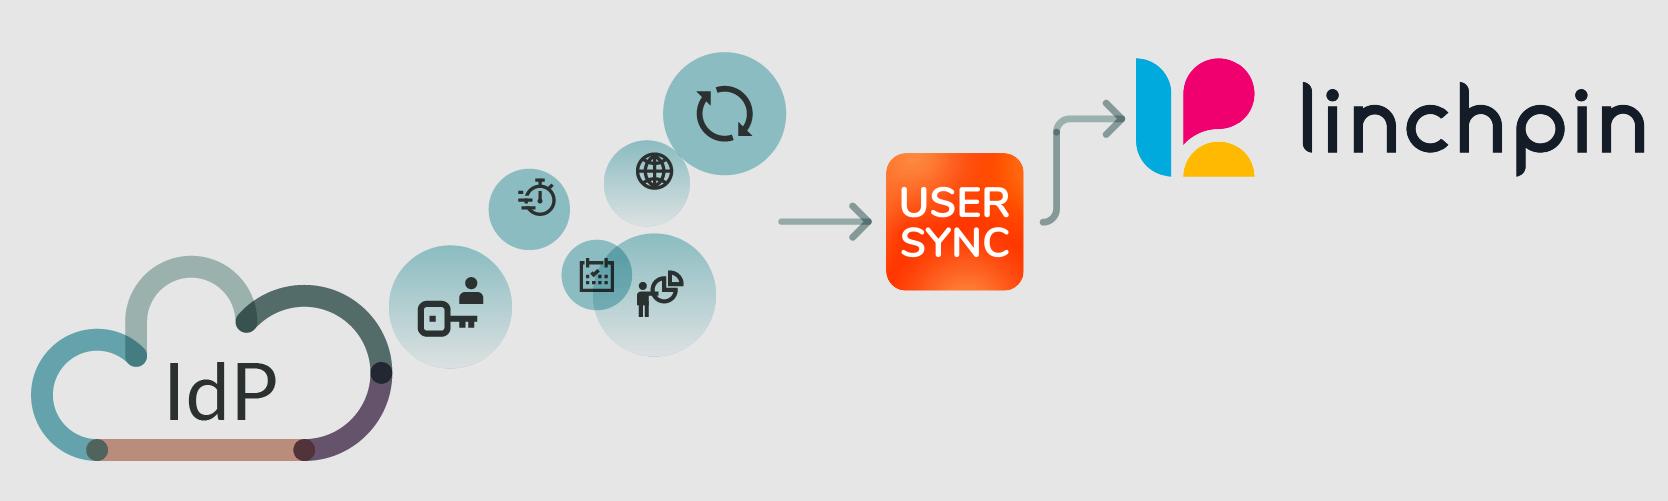 idp - usersync - linchpin